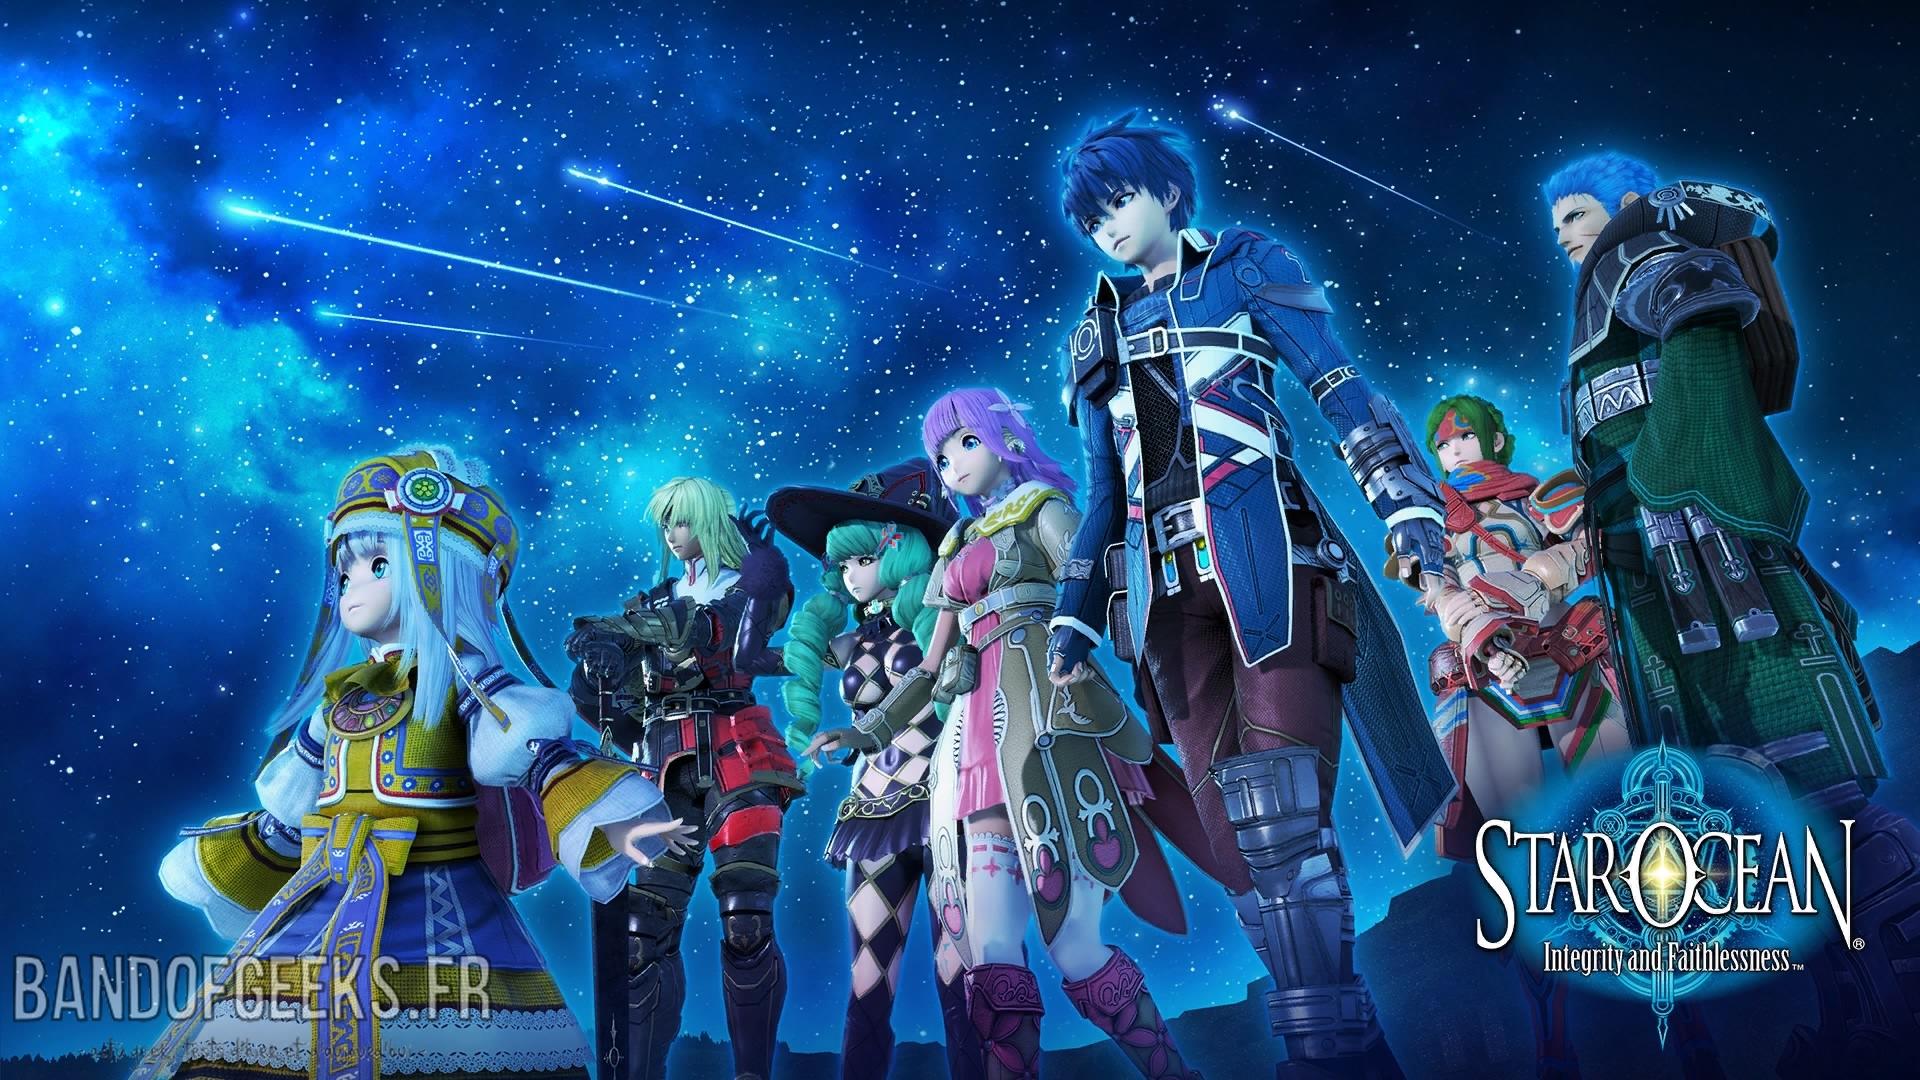 Star Ocean - Integrity and Faithlessness équipe au complet écran titre